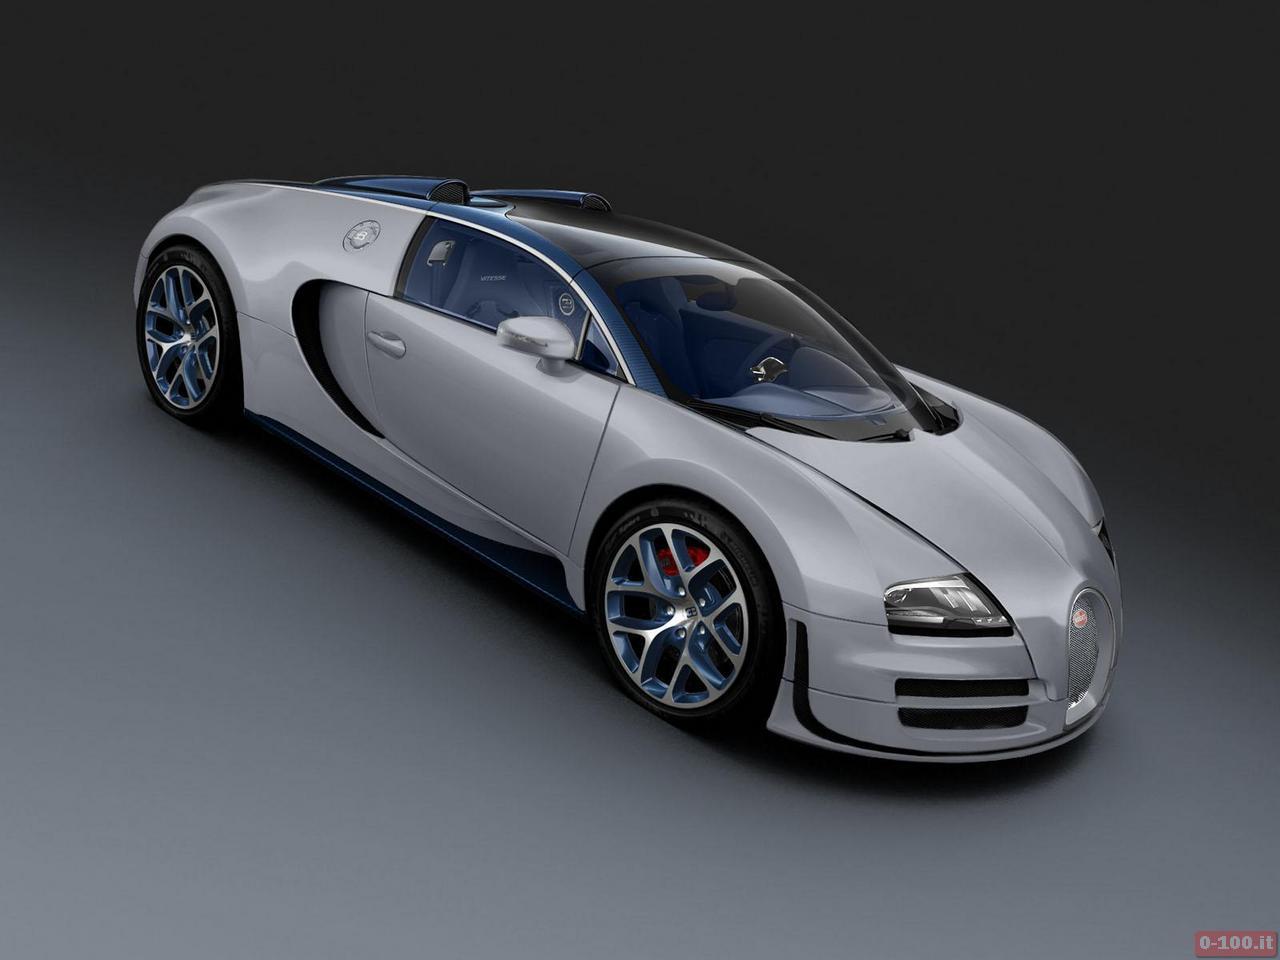 bugatti-veyron-16-4-grand-sport-vitesse-rafale_0-100_2